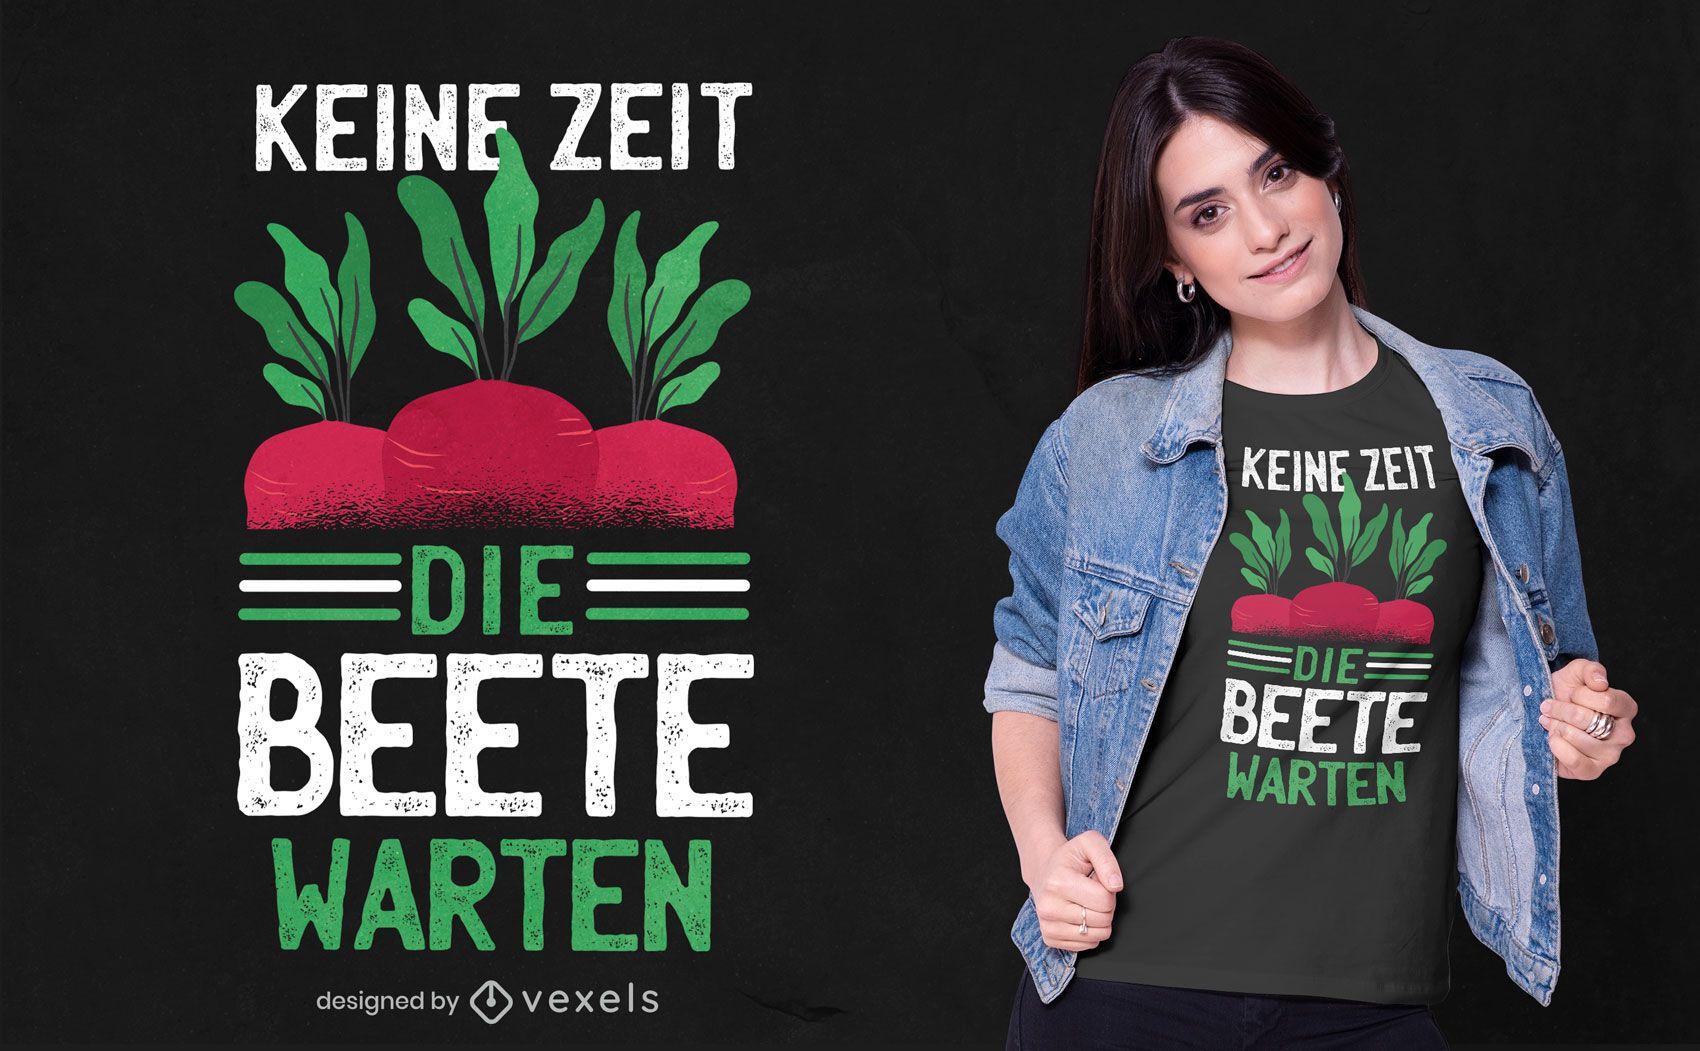 Beet German quote t-shirt design